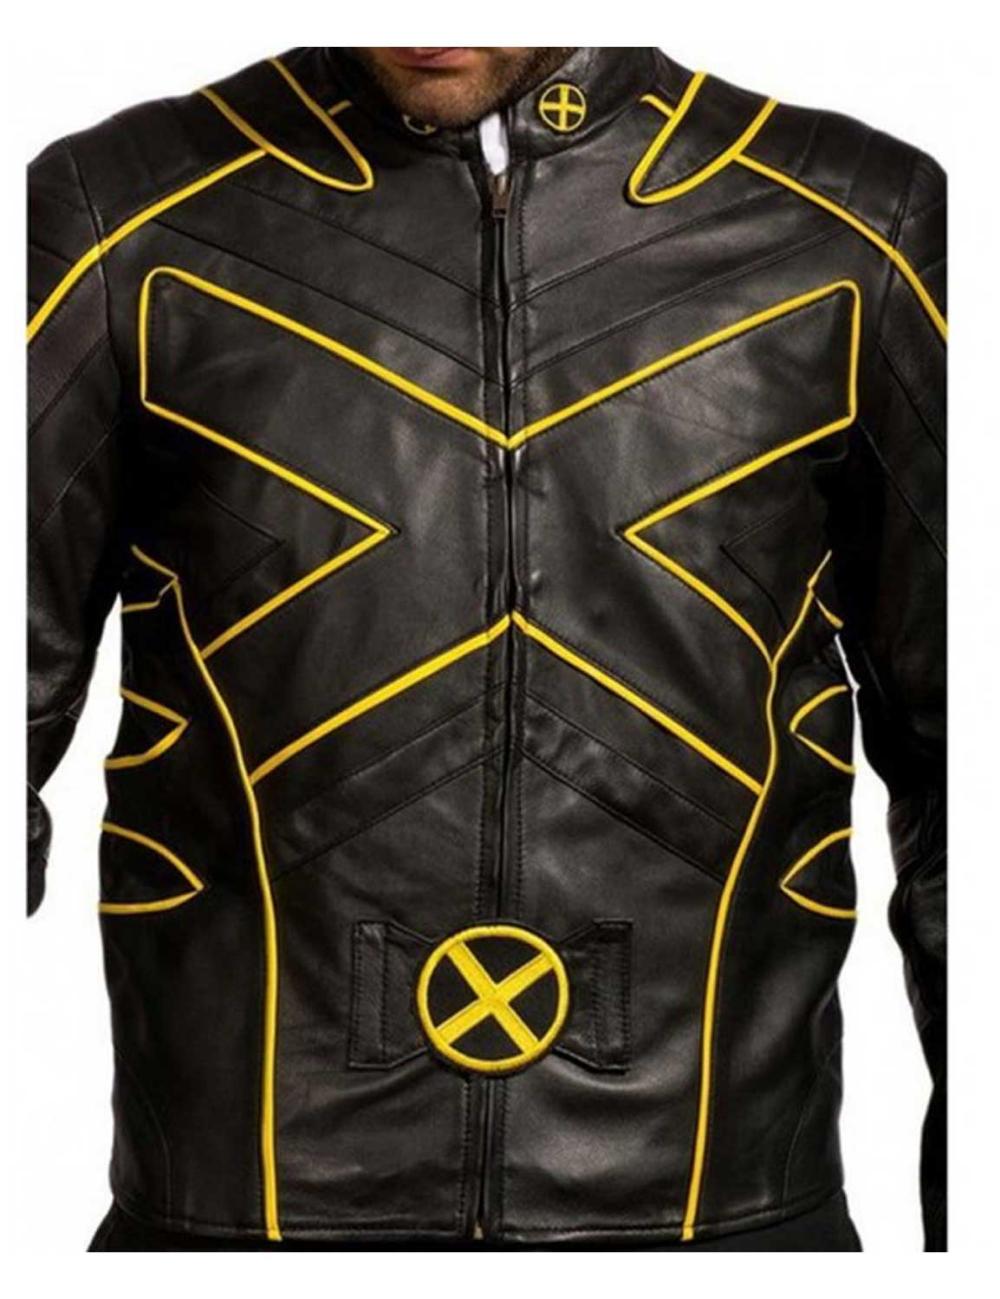 X Men The Last Stand Hugh Jackman Jacket Hugh Jackman Men Logo Jackets [ 1299 x 1000 Pixel ]